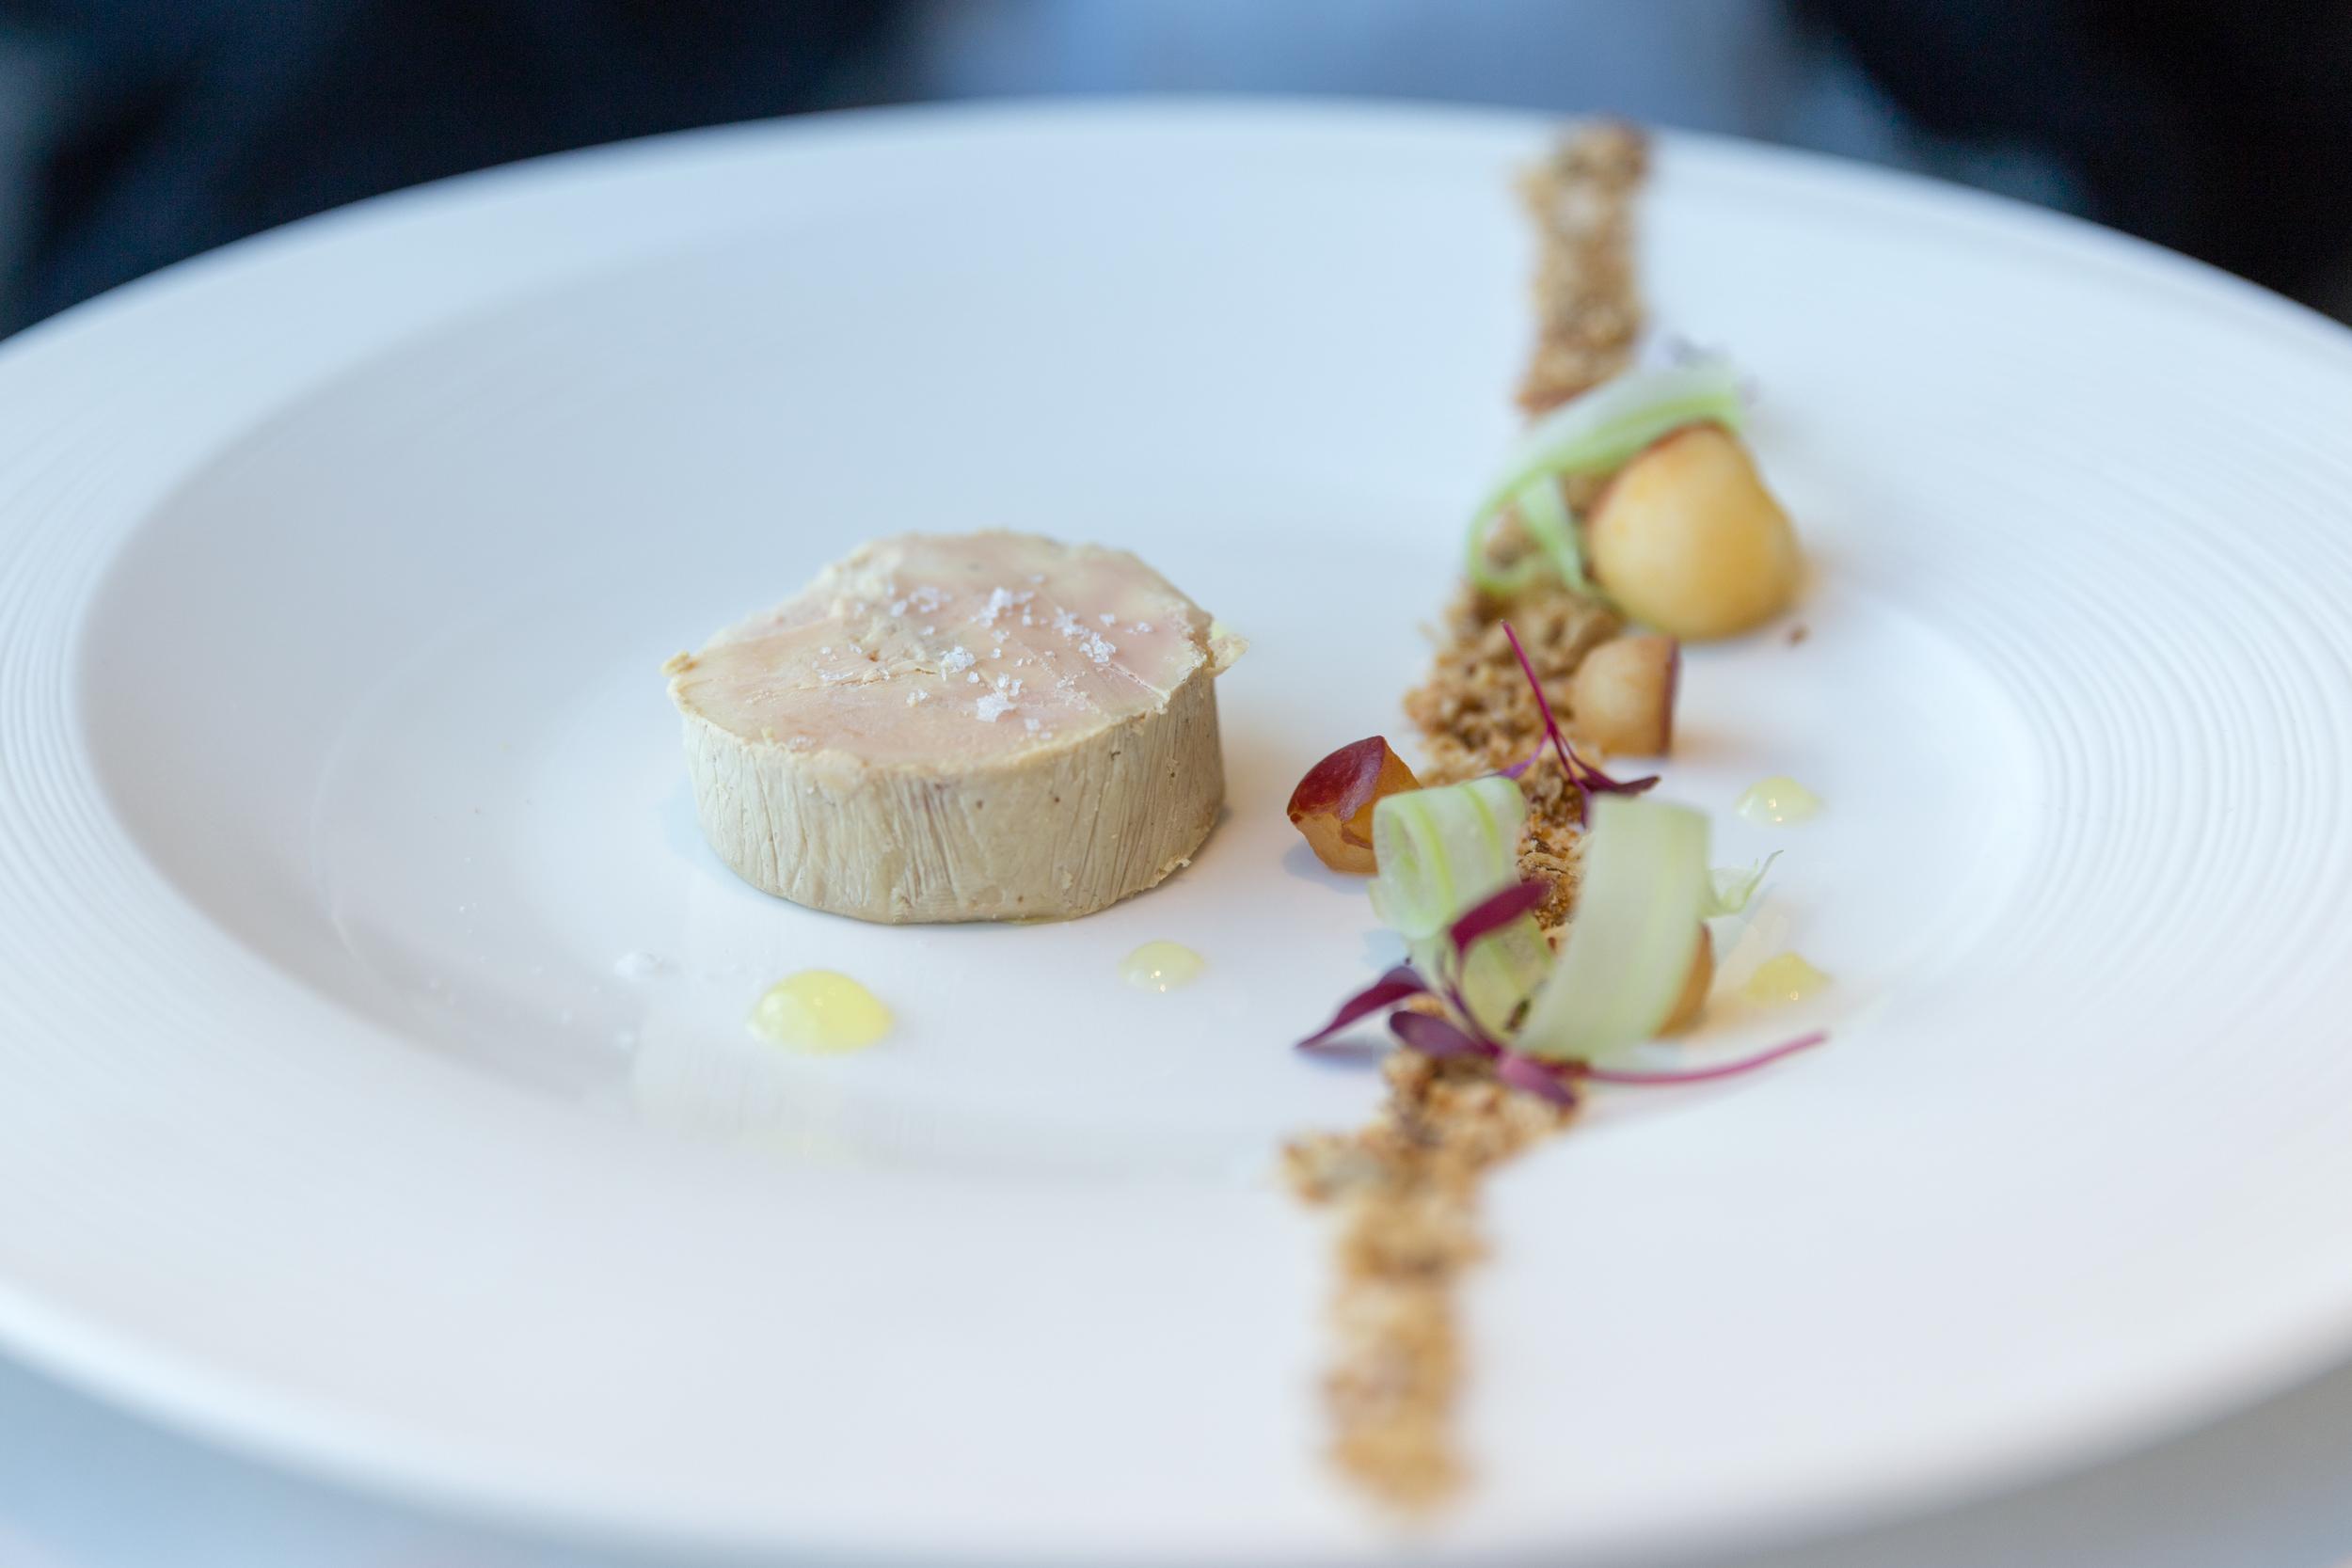 Duck and Foie Gras - Cherry, sour dough toast